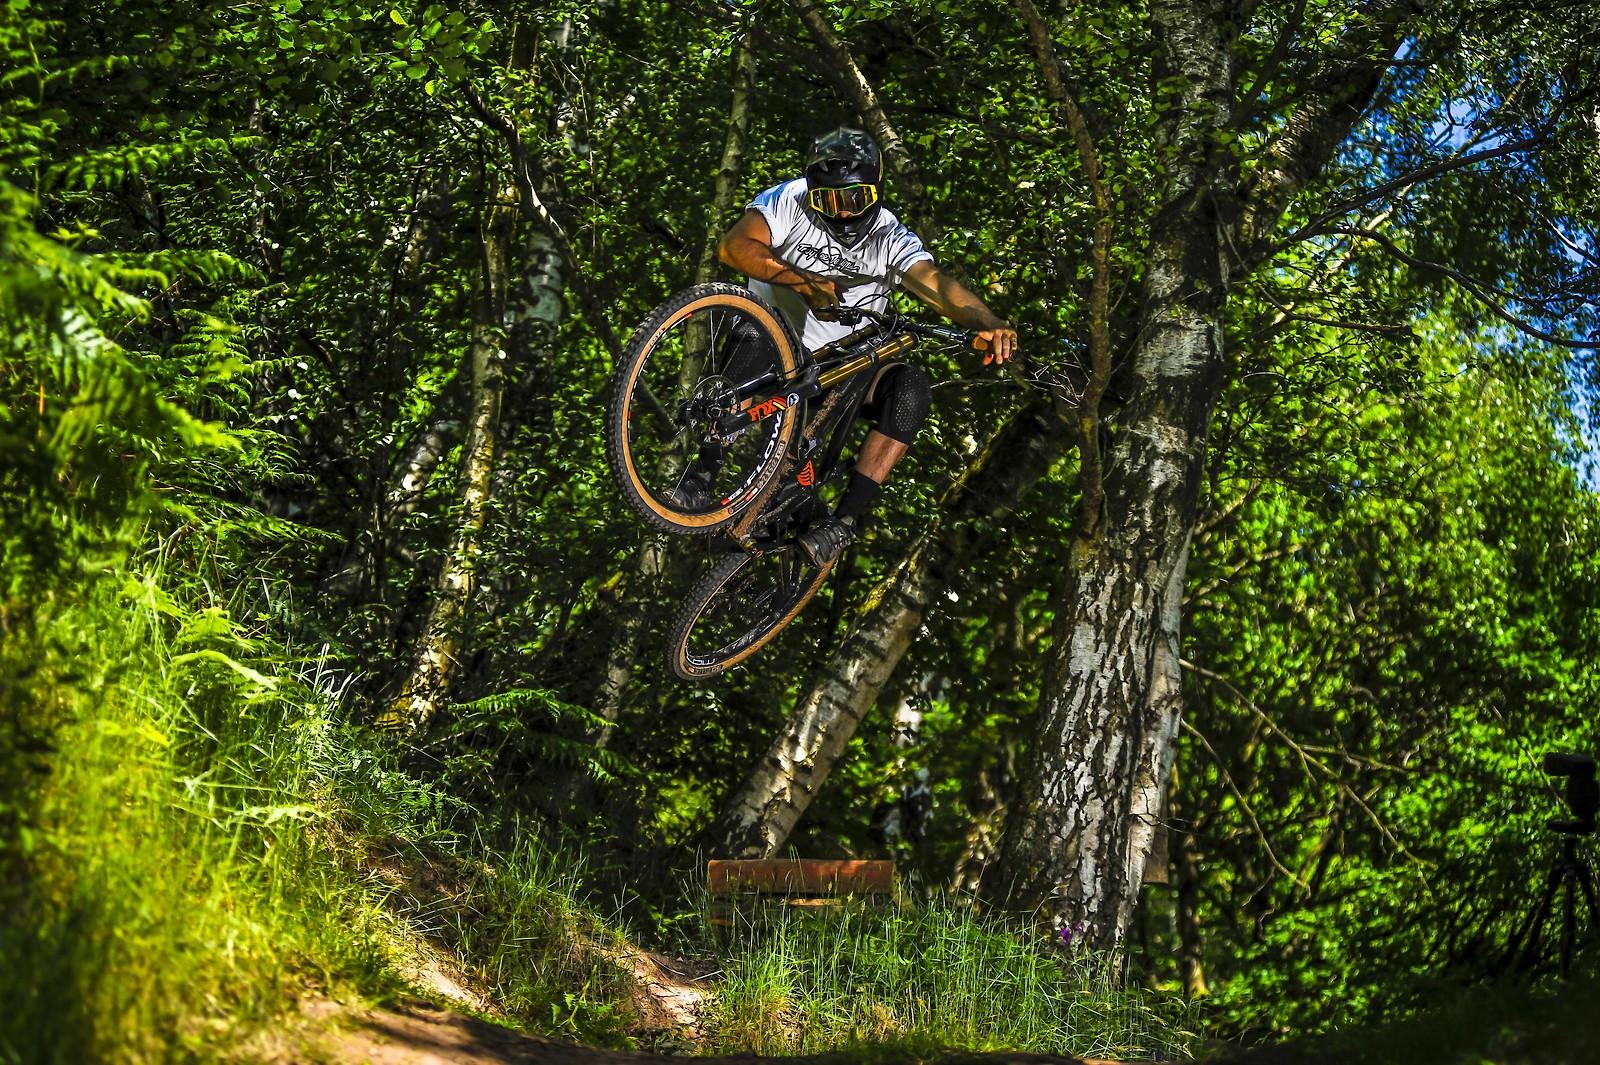 DSC1724 - robbarkerimages2017 - Mountain Biking Pictures - Vital MTB